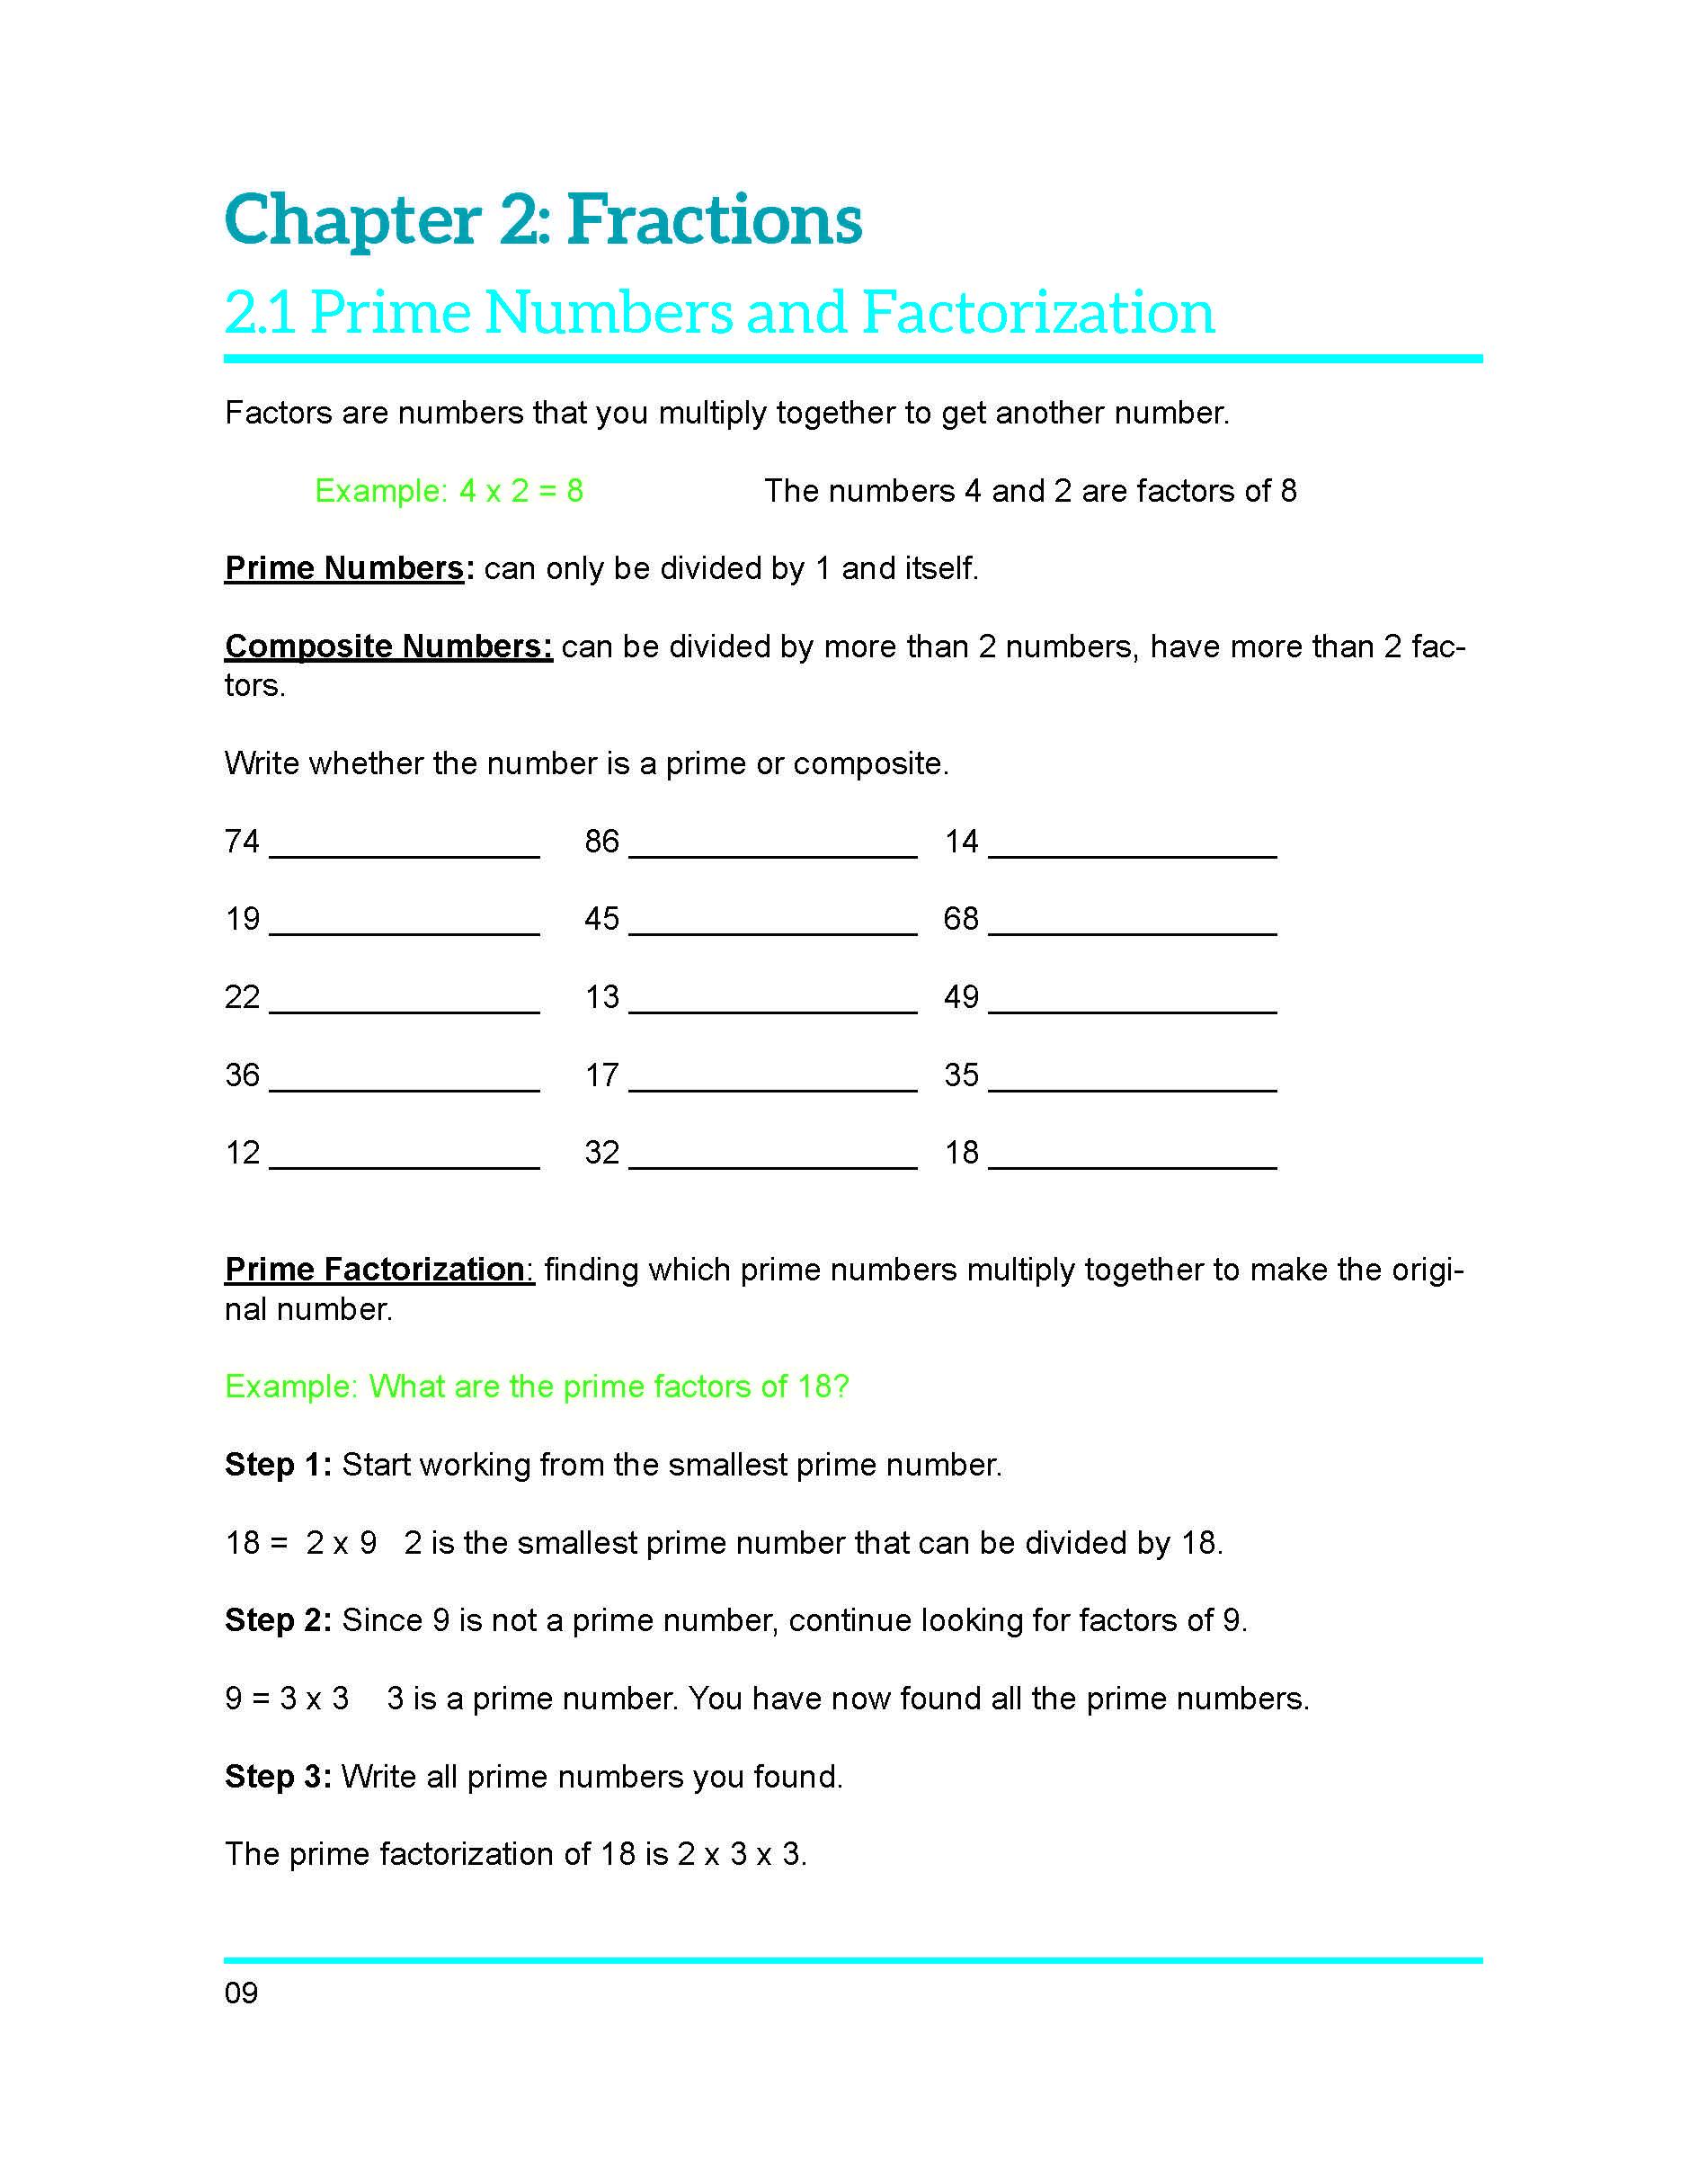 Grade-5-Fractions-Prime Numbers-Factorization.jpg